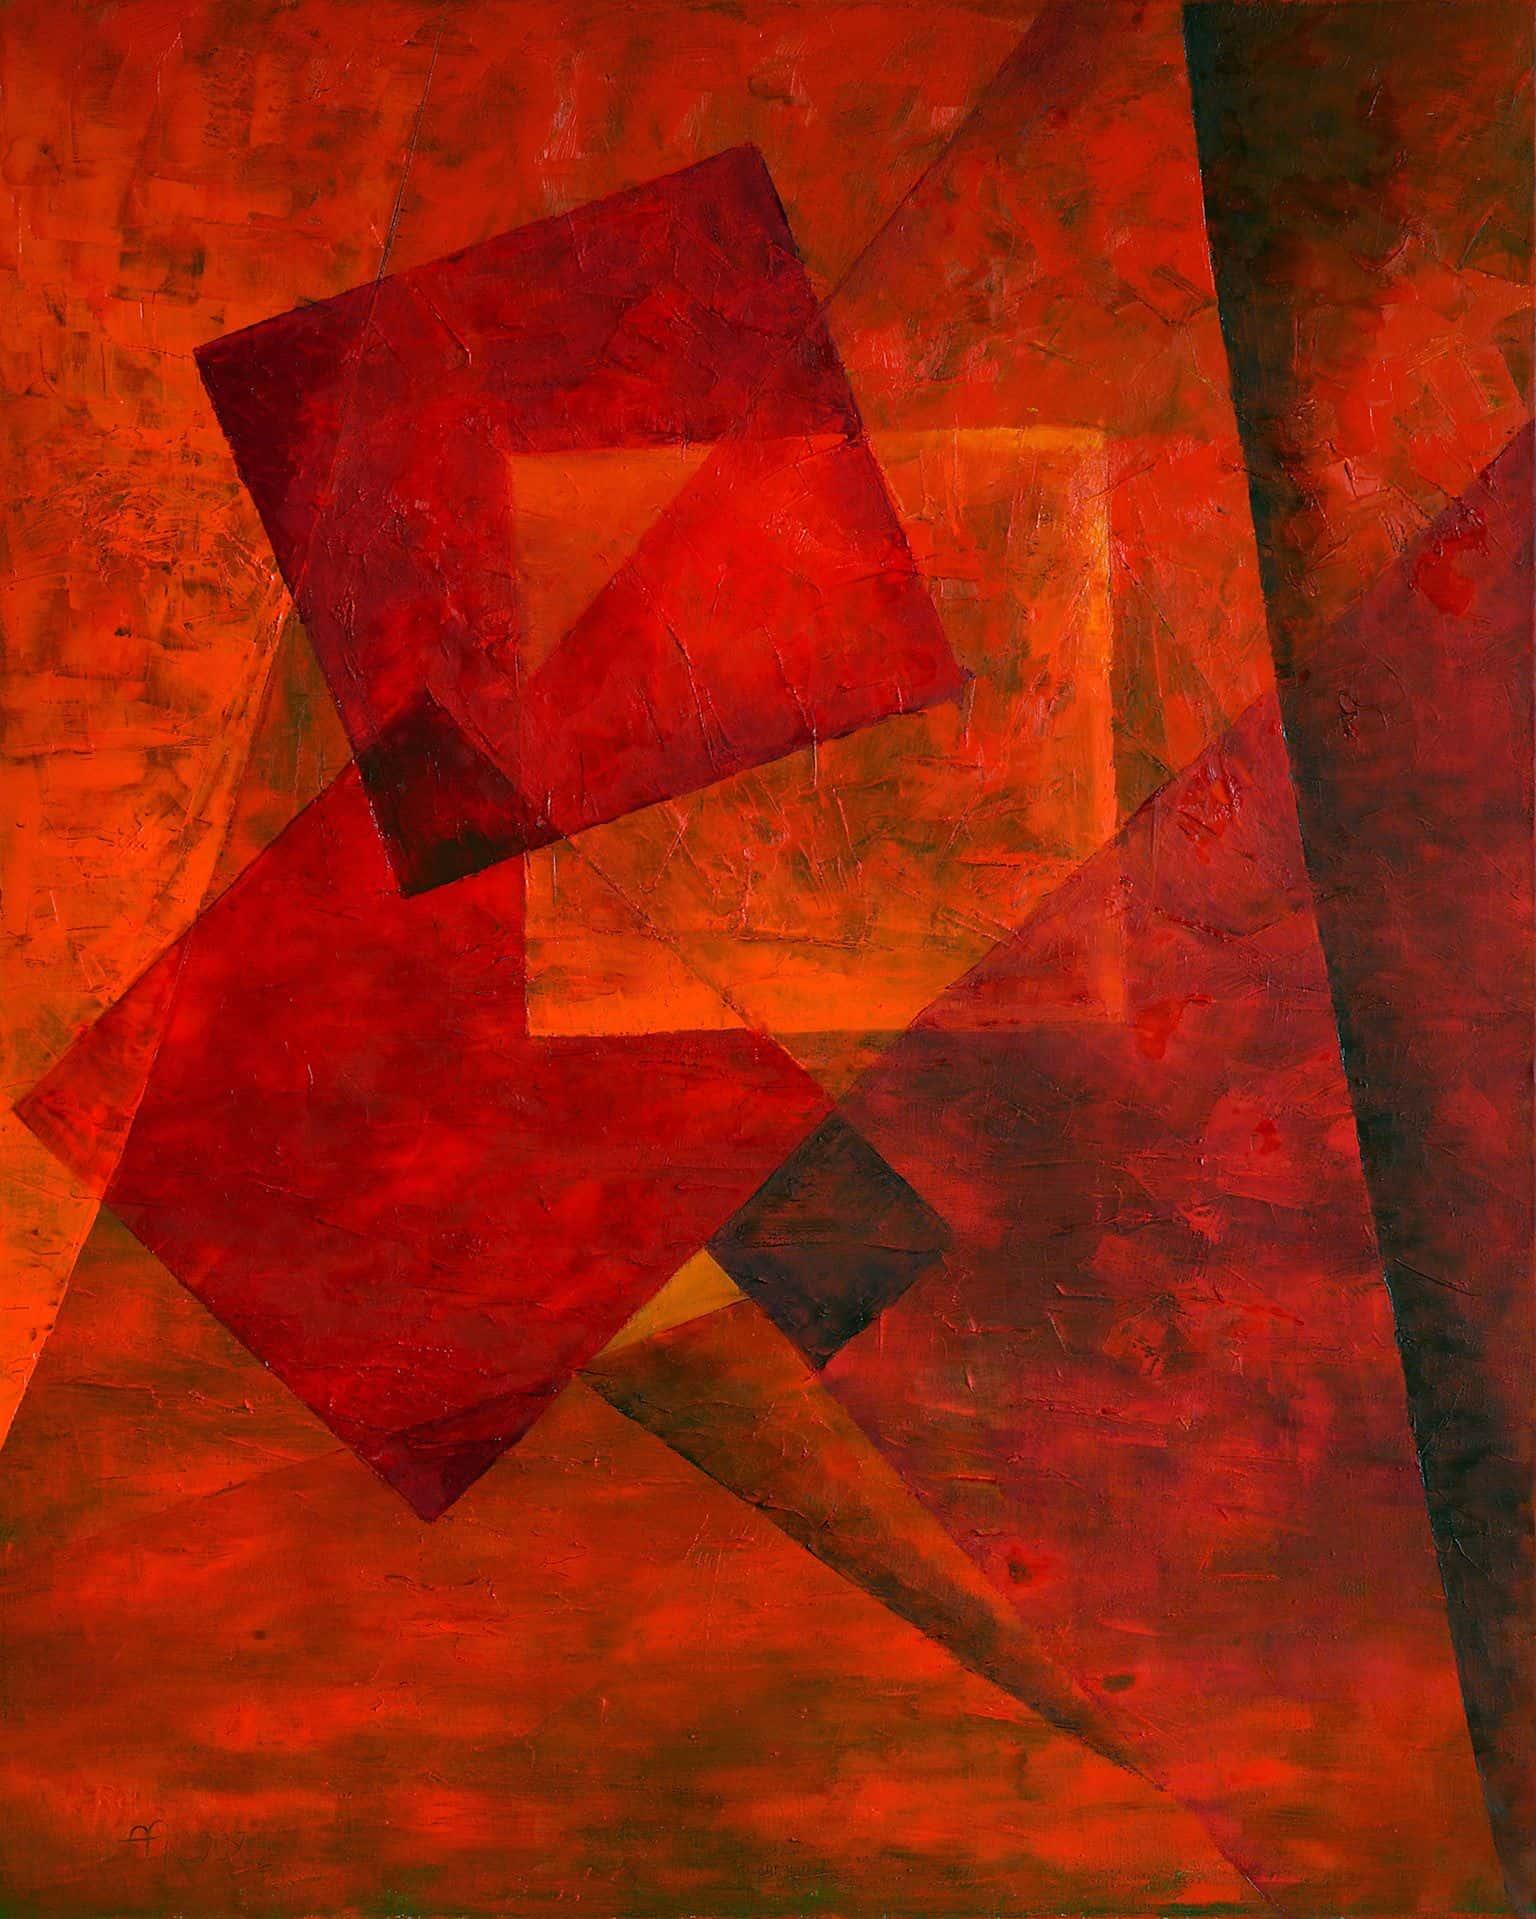 rote-karte-2008-100x80